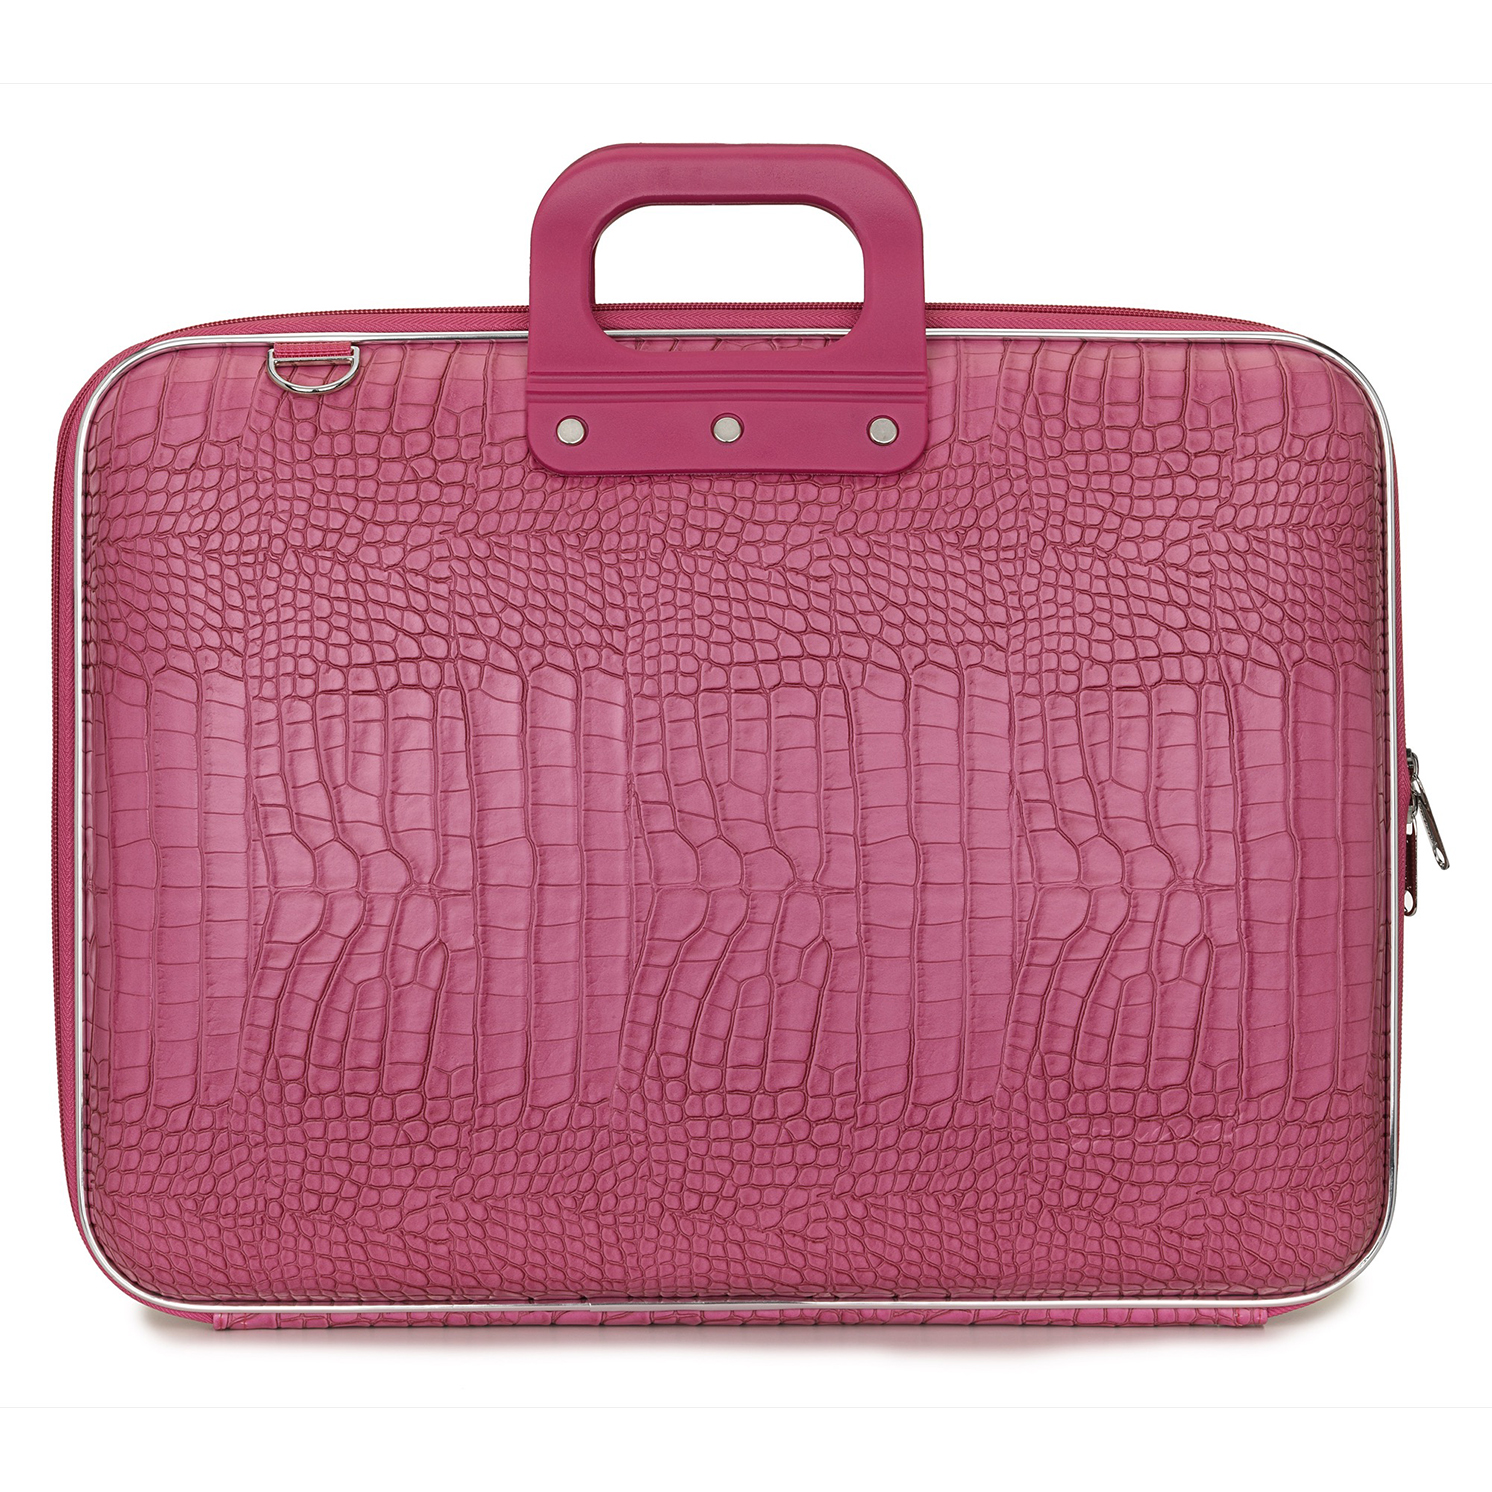 Bombata – Pink Maxi Cocco 17″ Laptop Case/Bag with Shoulder Strap